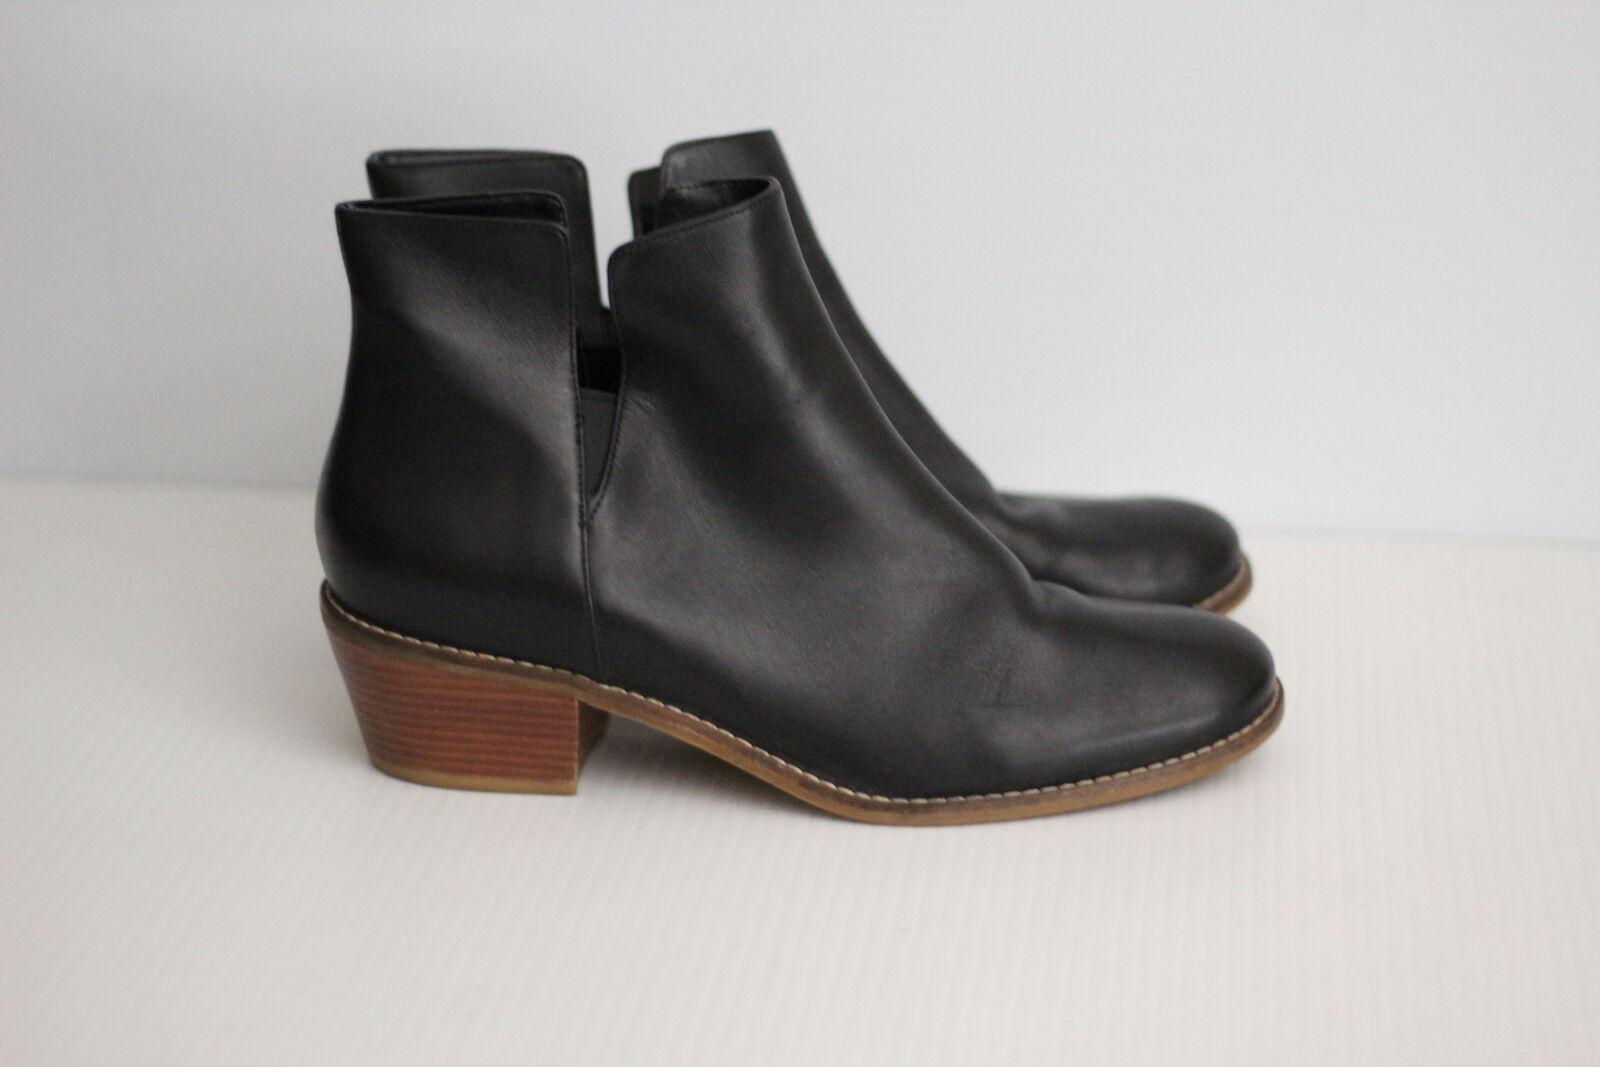 vendita scontata online di factory outlet Cole Haan Abbot Chelsea avvio D44240 - nero Leather Leather Leather - 9 B  (C42)  autentico